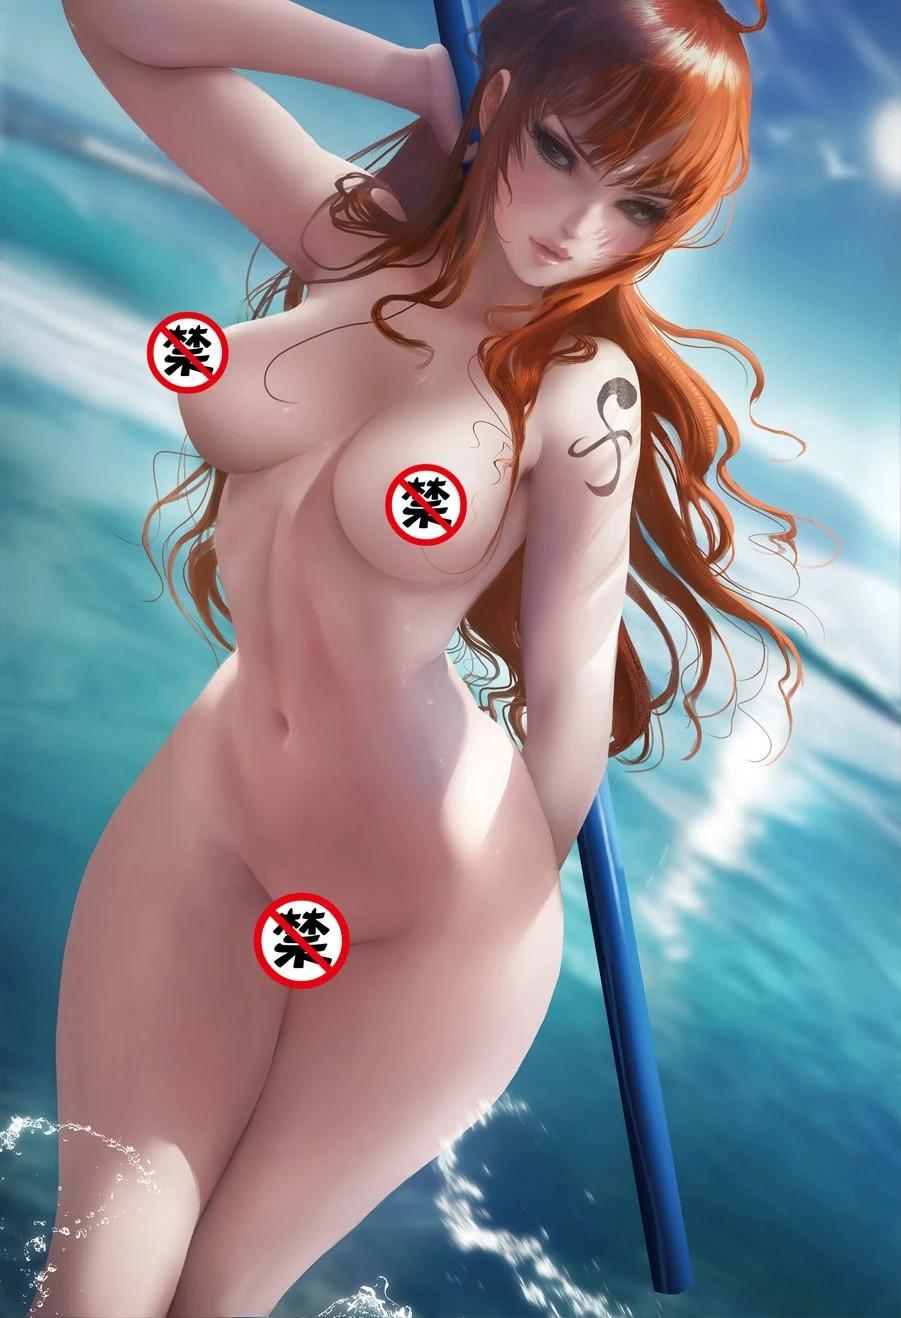 One piece nami naked